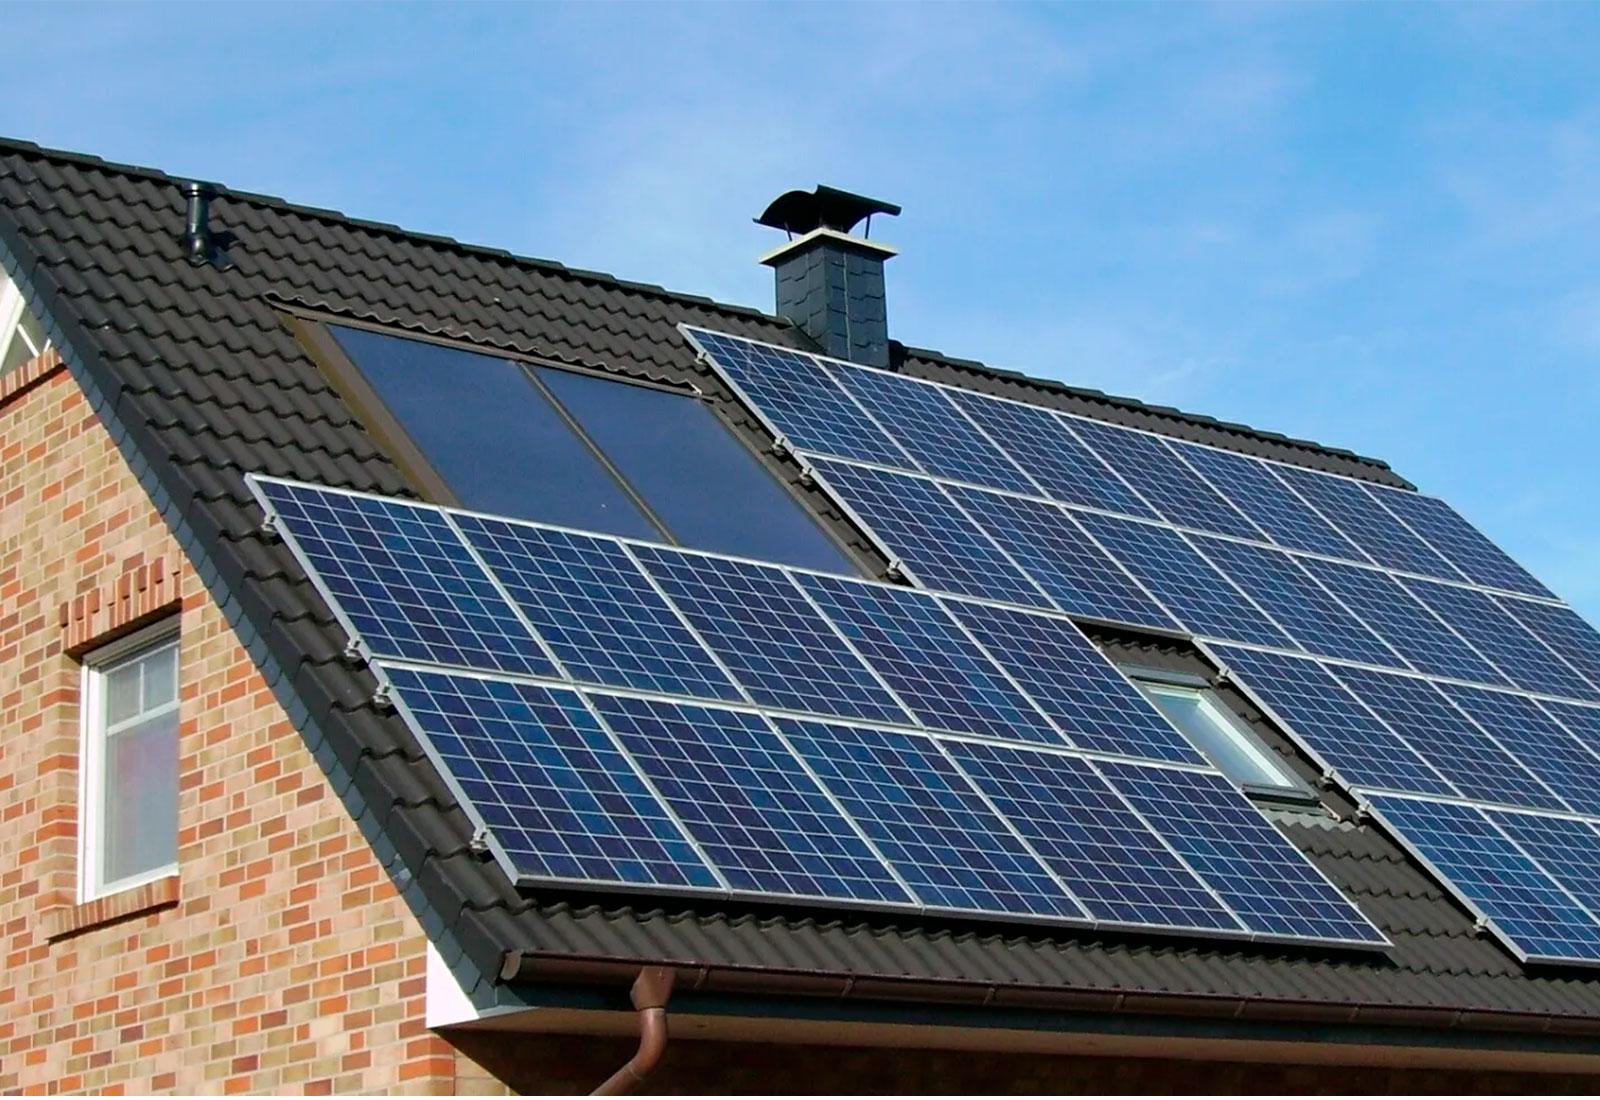 vivienda unifamiliar con paneles solares